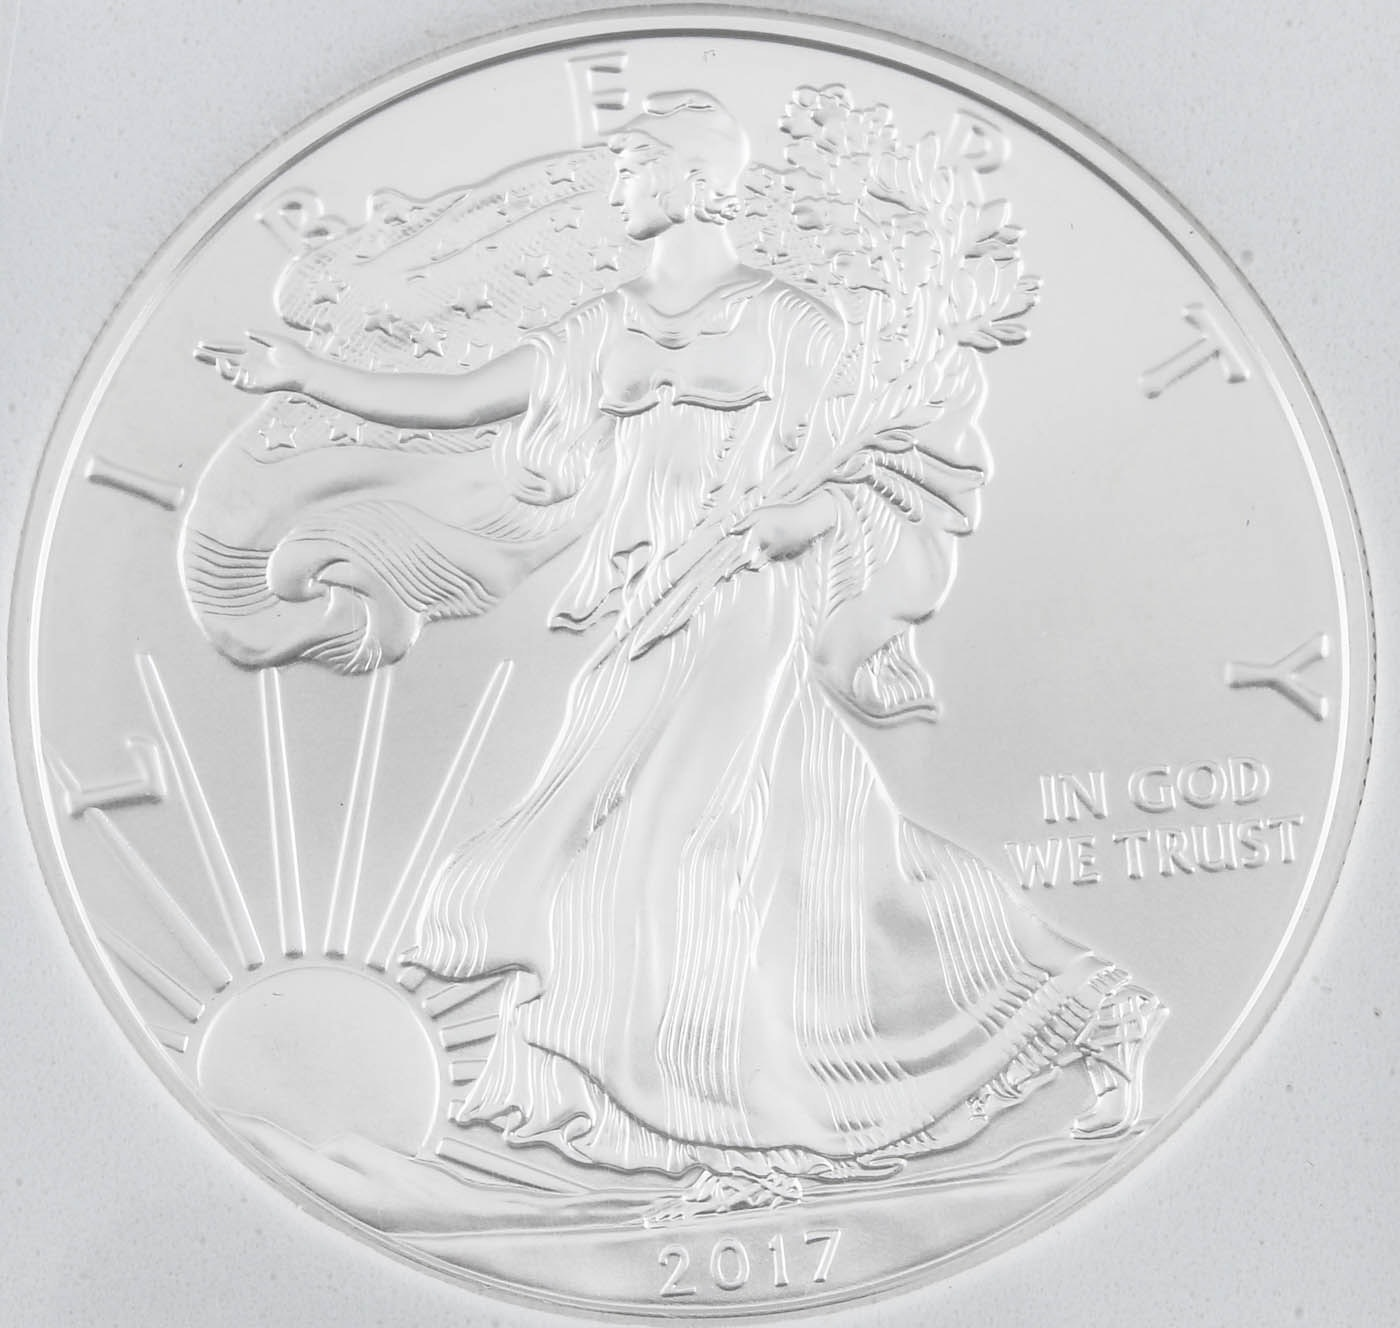 Encapsulated 2017 One Dollar U.S. Silver Eagle